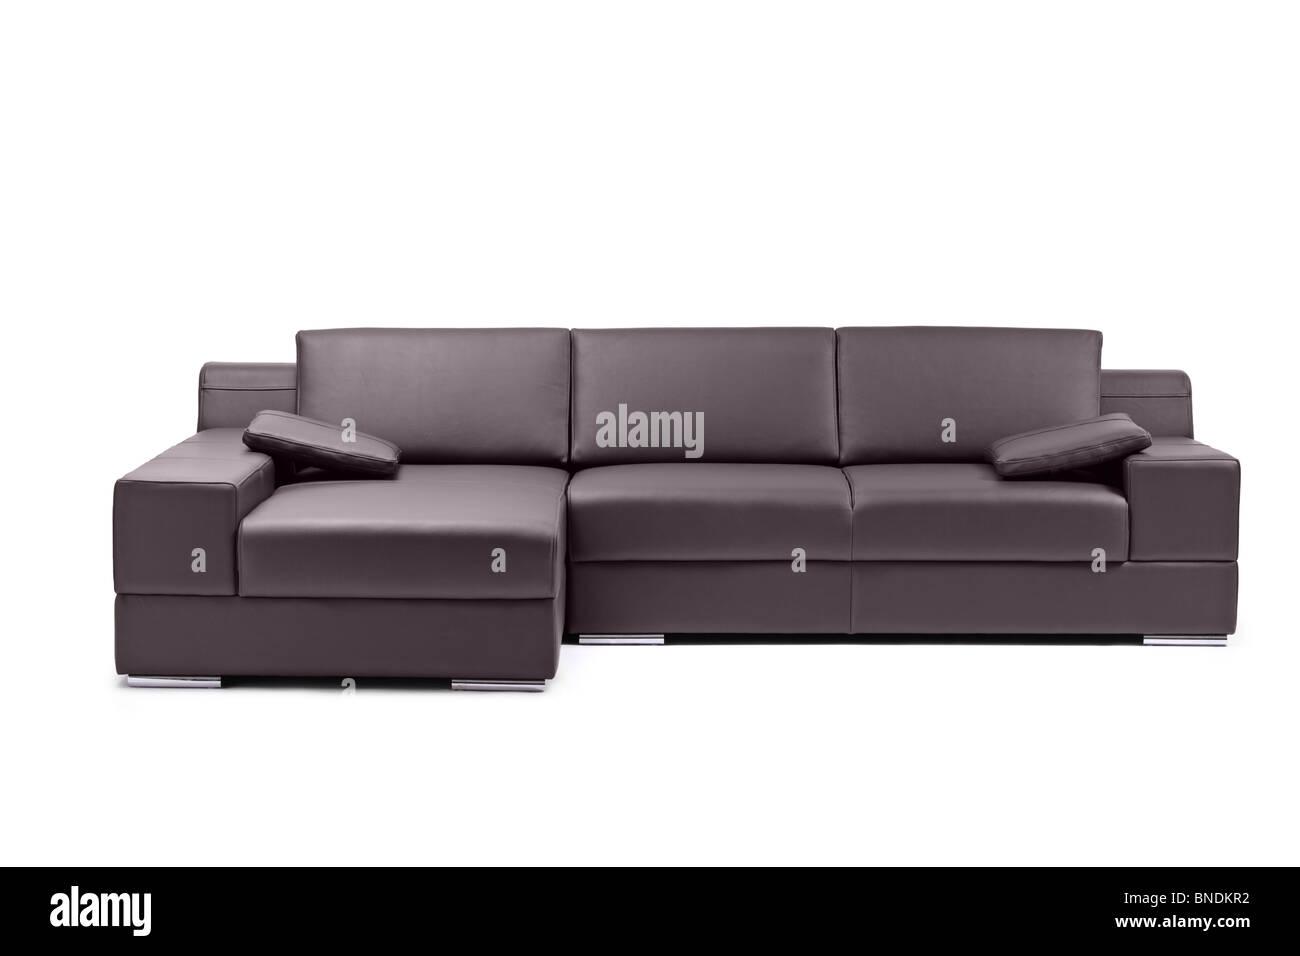 Un moderno sofá de cuero negro. Imagen De Stock